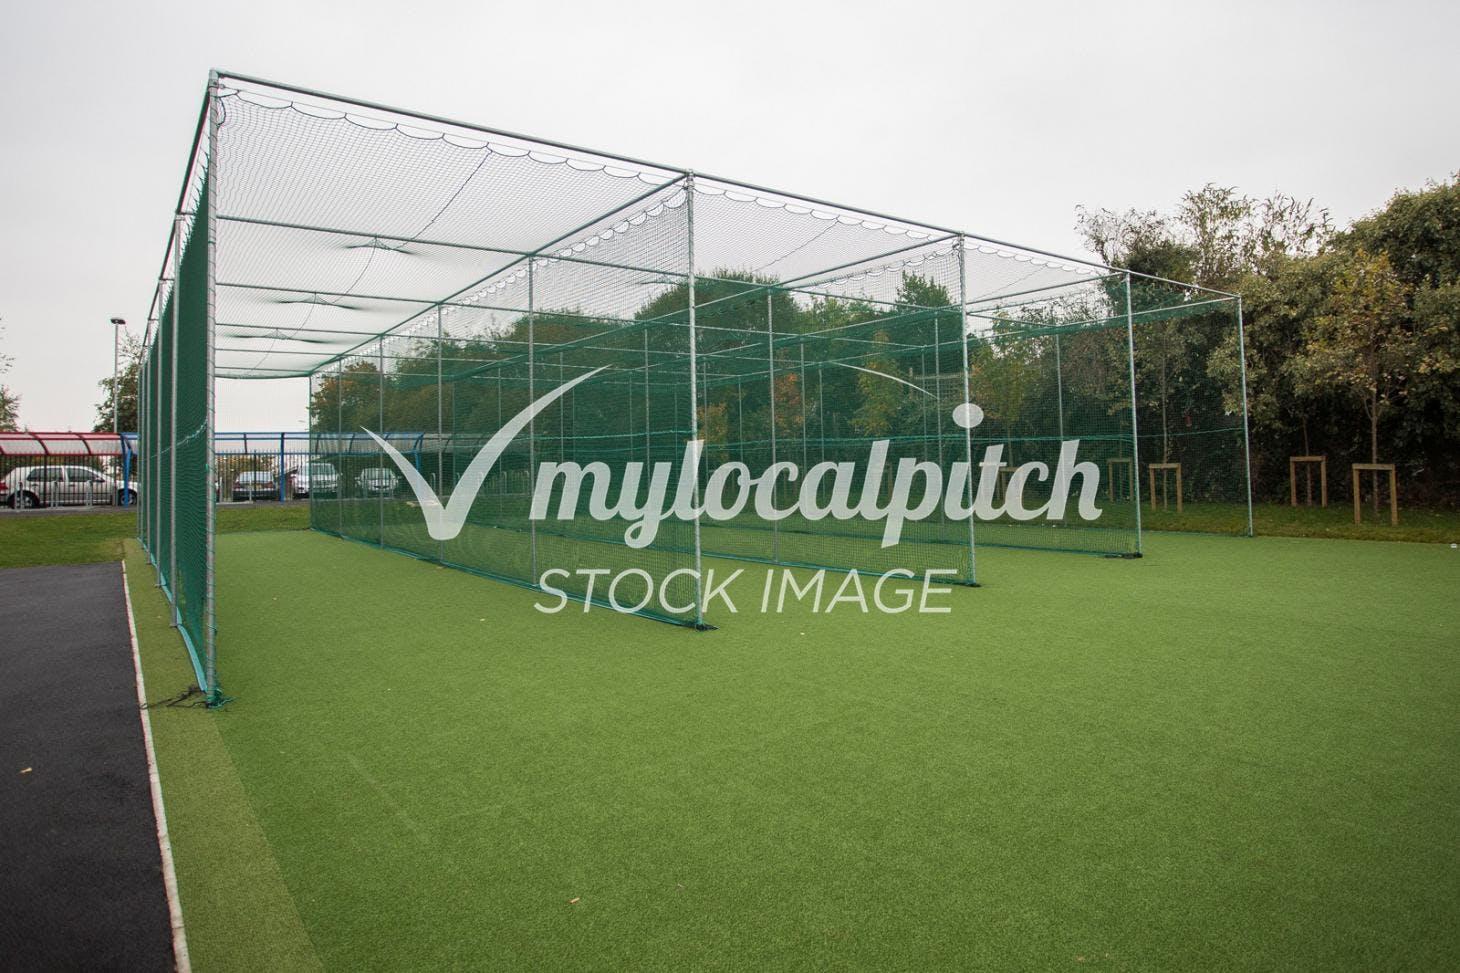 London Marathon Playing Fields - Redbridge Nets | Artificial cricket facilities